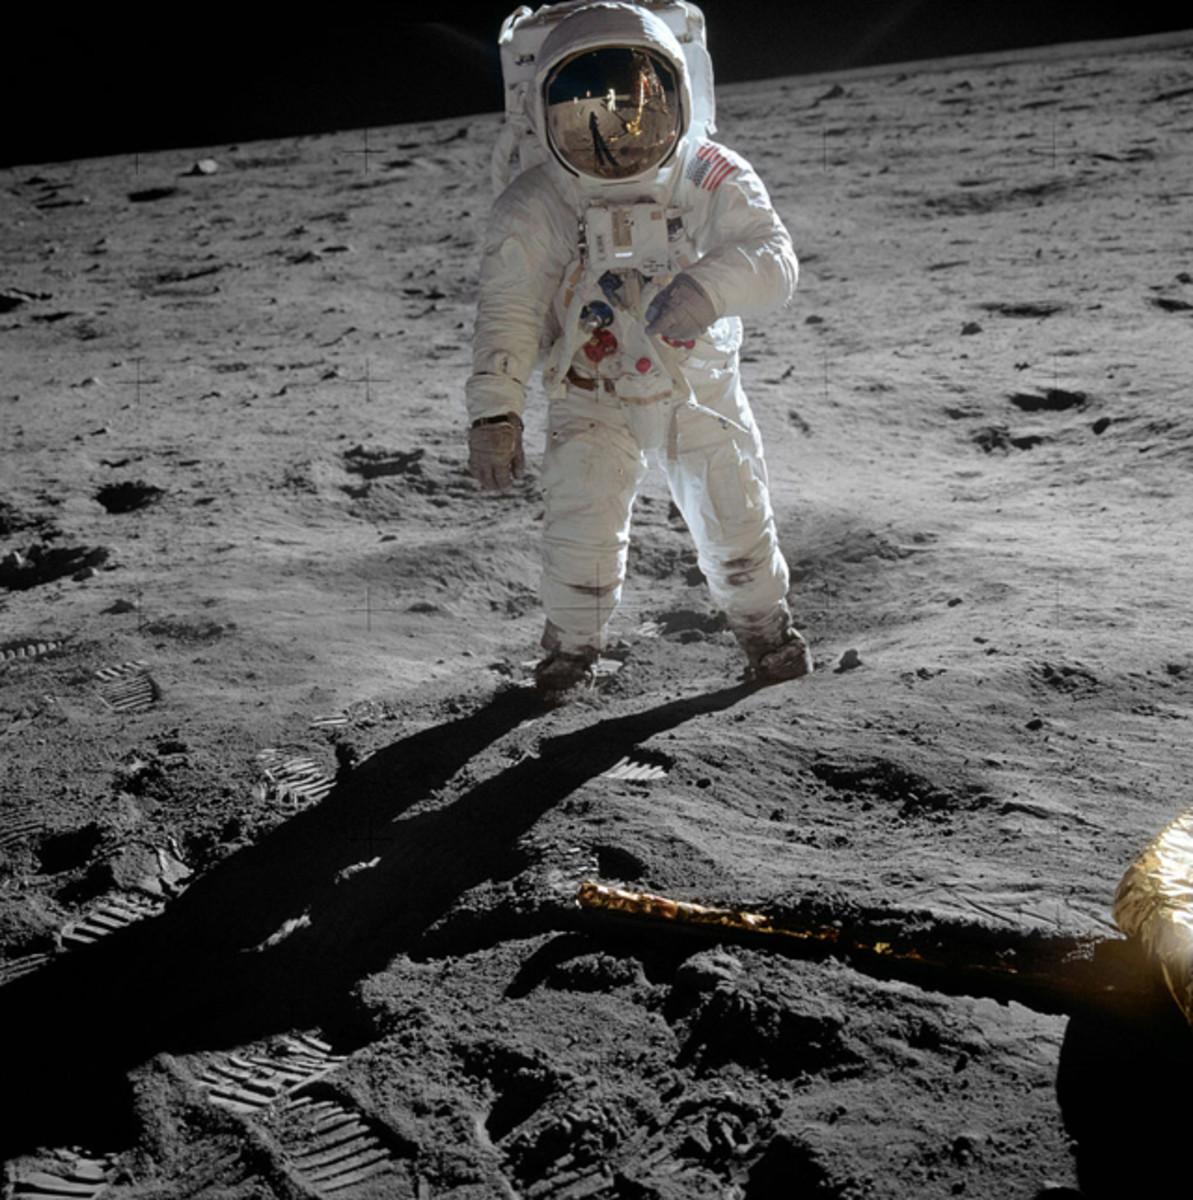 Photo of Apollo 11 astronaut Buzz Aldrin on the surface of the Moon.